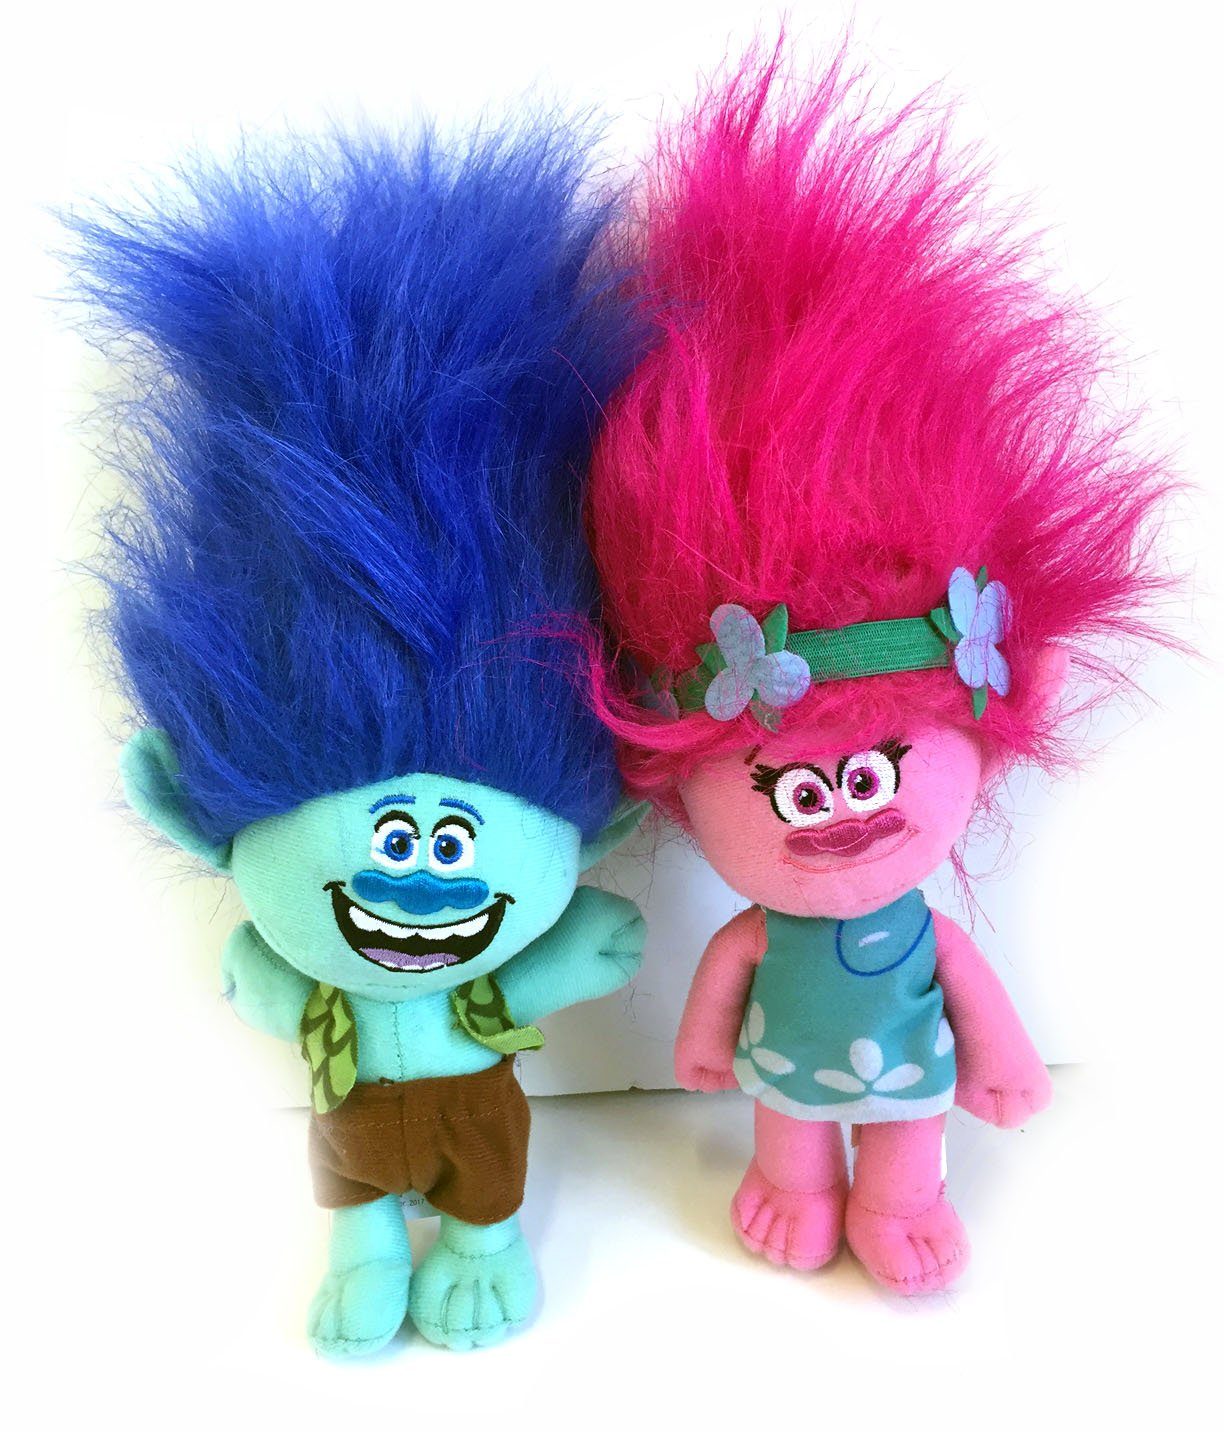 DreamWorks Trolls Movie - Trolls Branch and Poppy 9'' Doll Set - 2 Piece Set by DREAMWORKS TROLLS